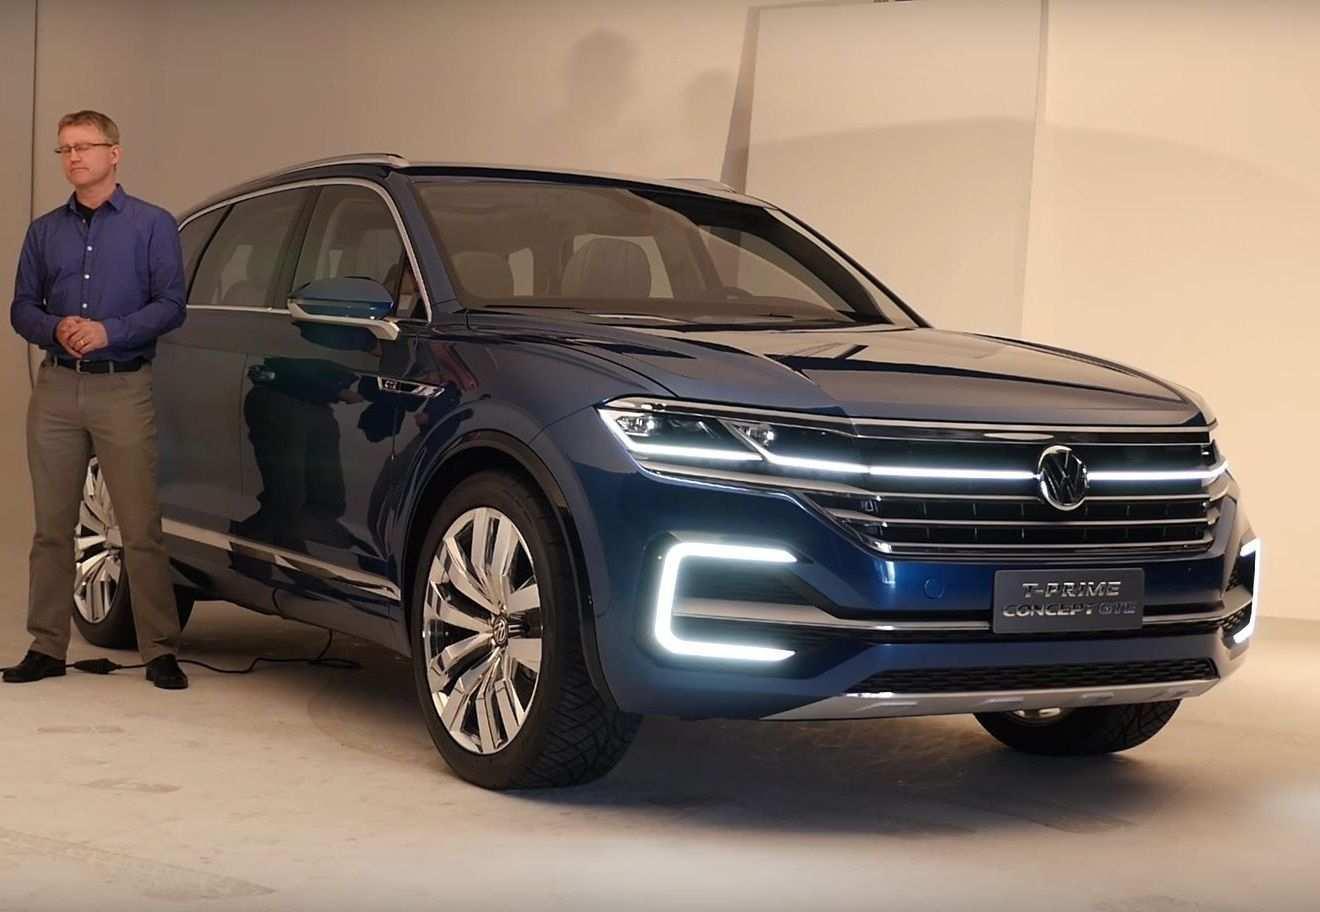 43 Concept of VW Touareg 2020 New Concept Exterior with VW Touareg 2020 New Concept